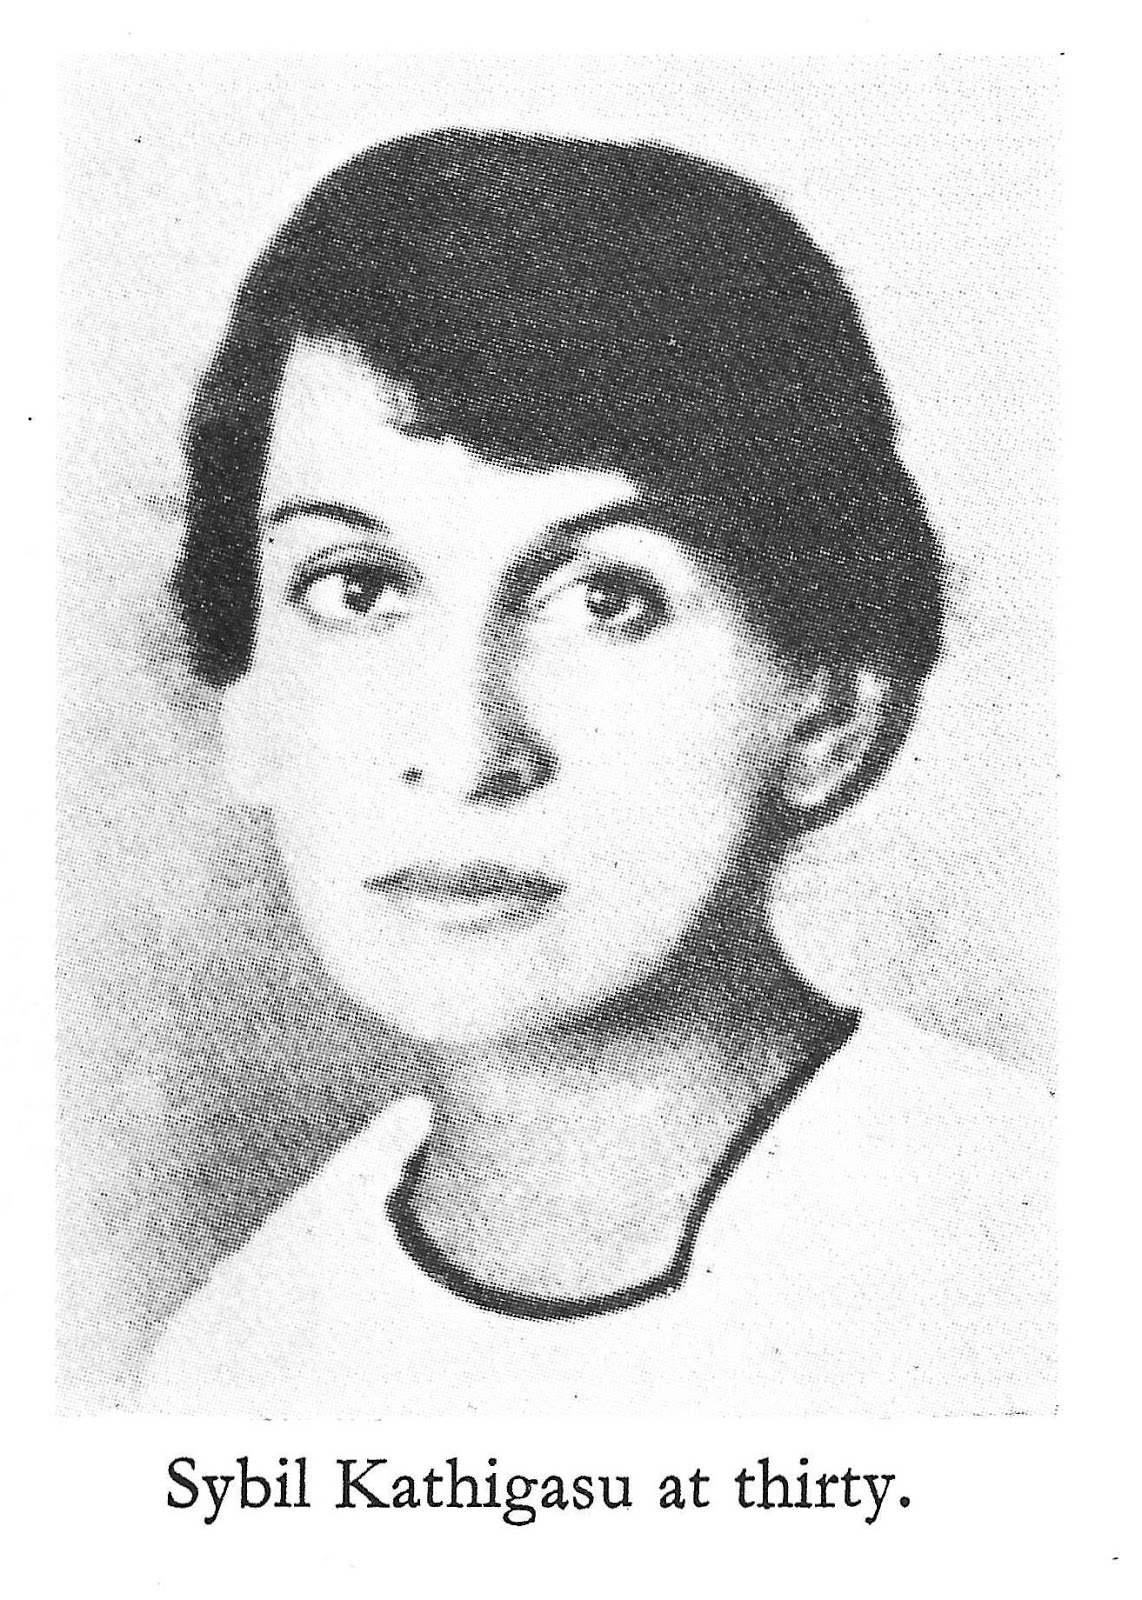 Image from Women Heroes of World War II